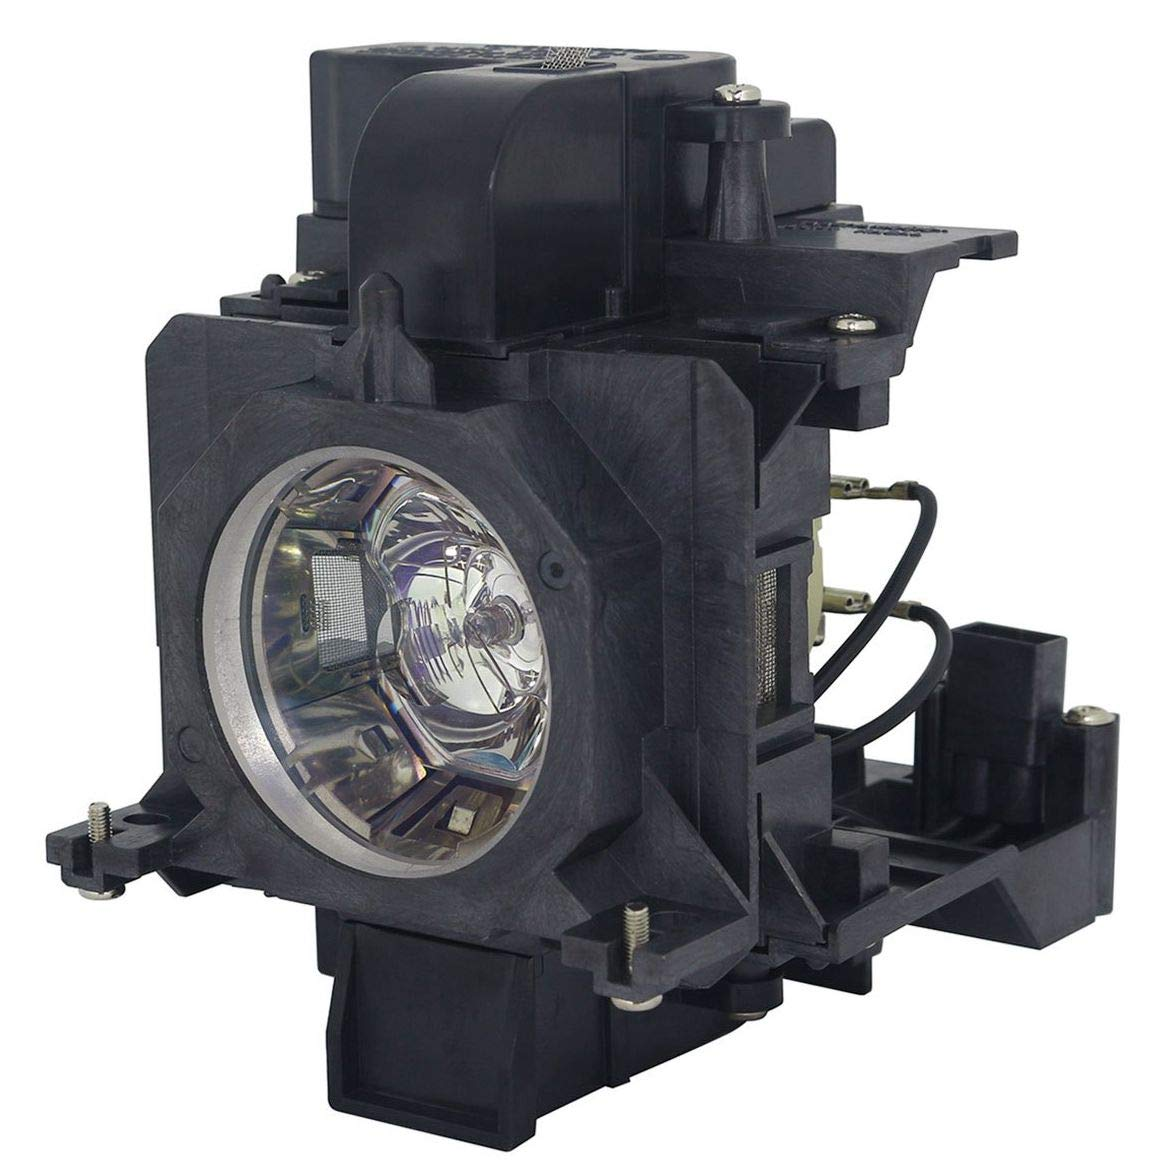 ET-LAE200 Projector Lamp for PANASONIC PT-EW530E PT-EW630E PT-EW630EL PT-EX500E PT-EZ570EL PT-EW530 PT-EX600 PT-EX500